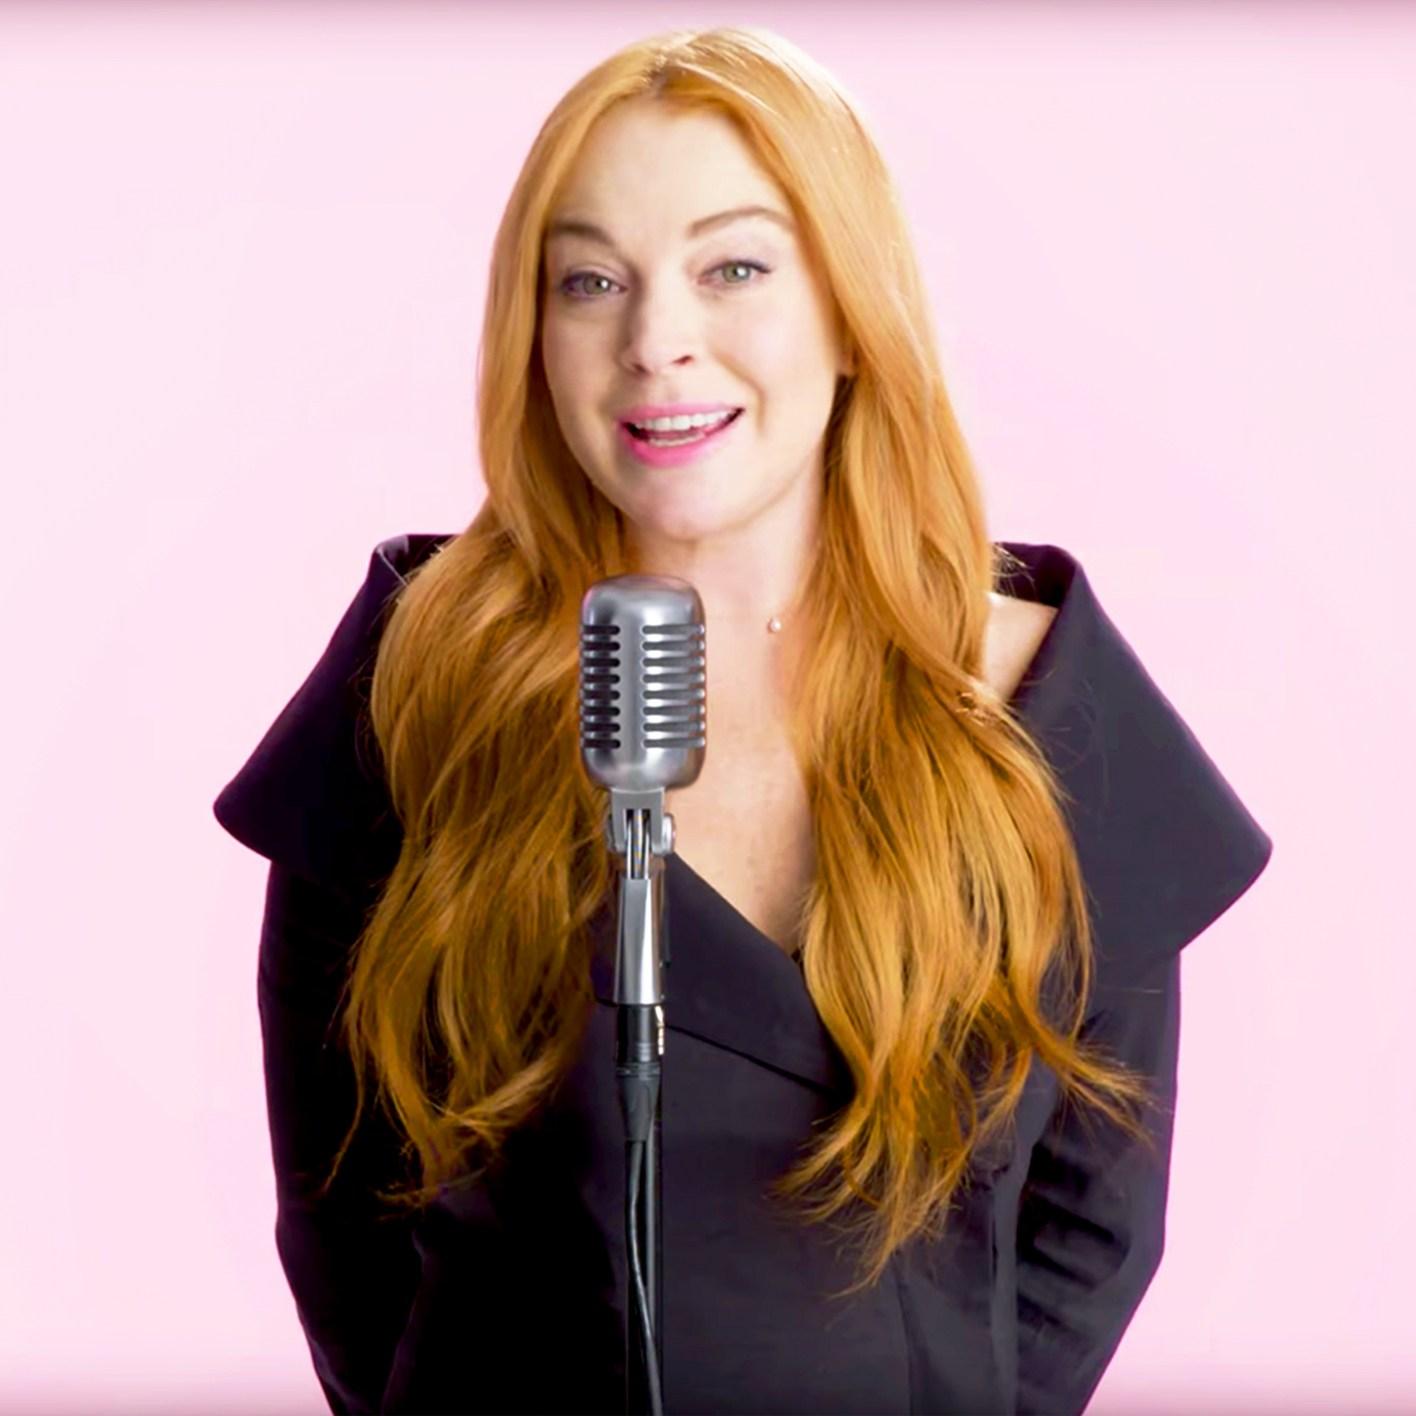 'Mean Girls' star Lindsay Lohan